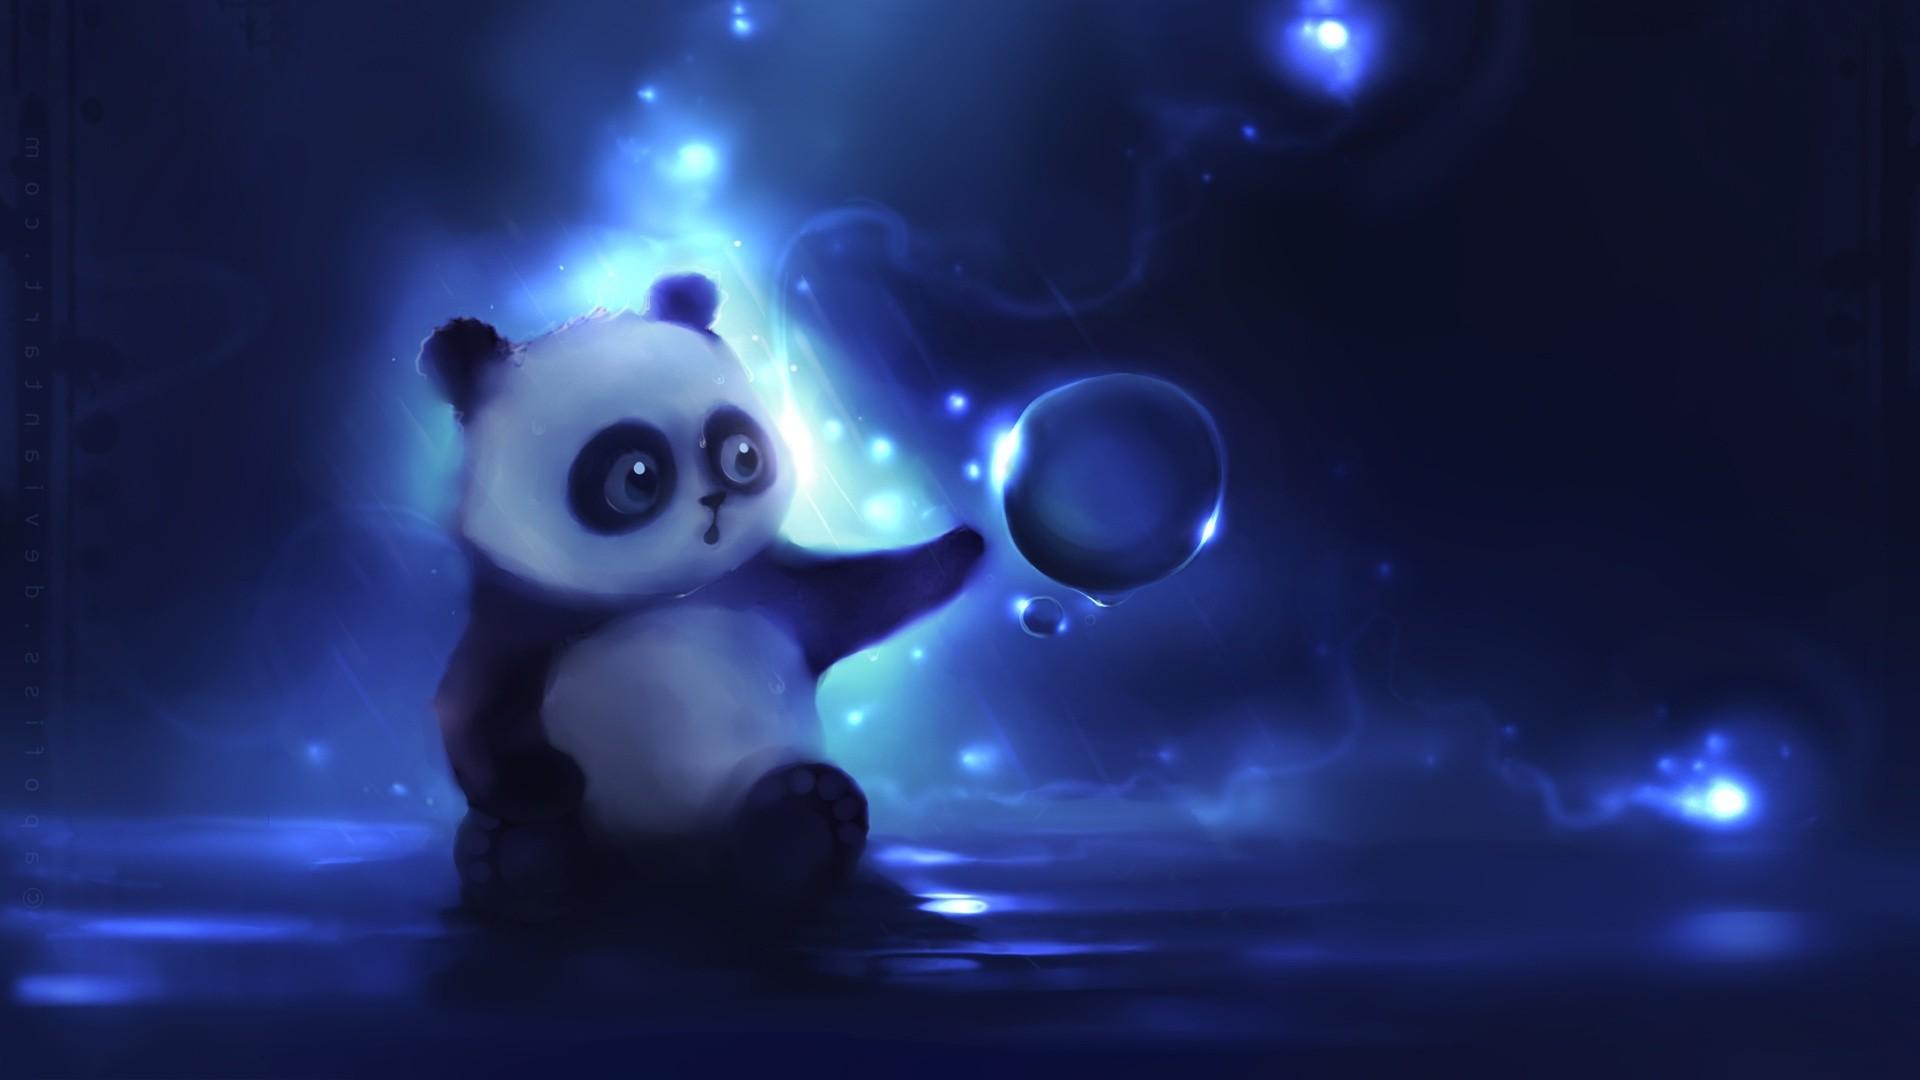 Anime Panda Wallpaper (70+ images)